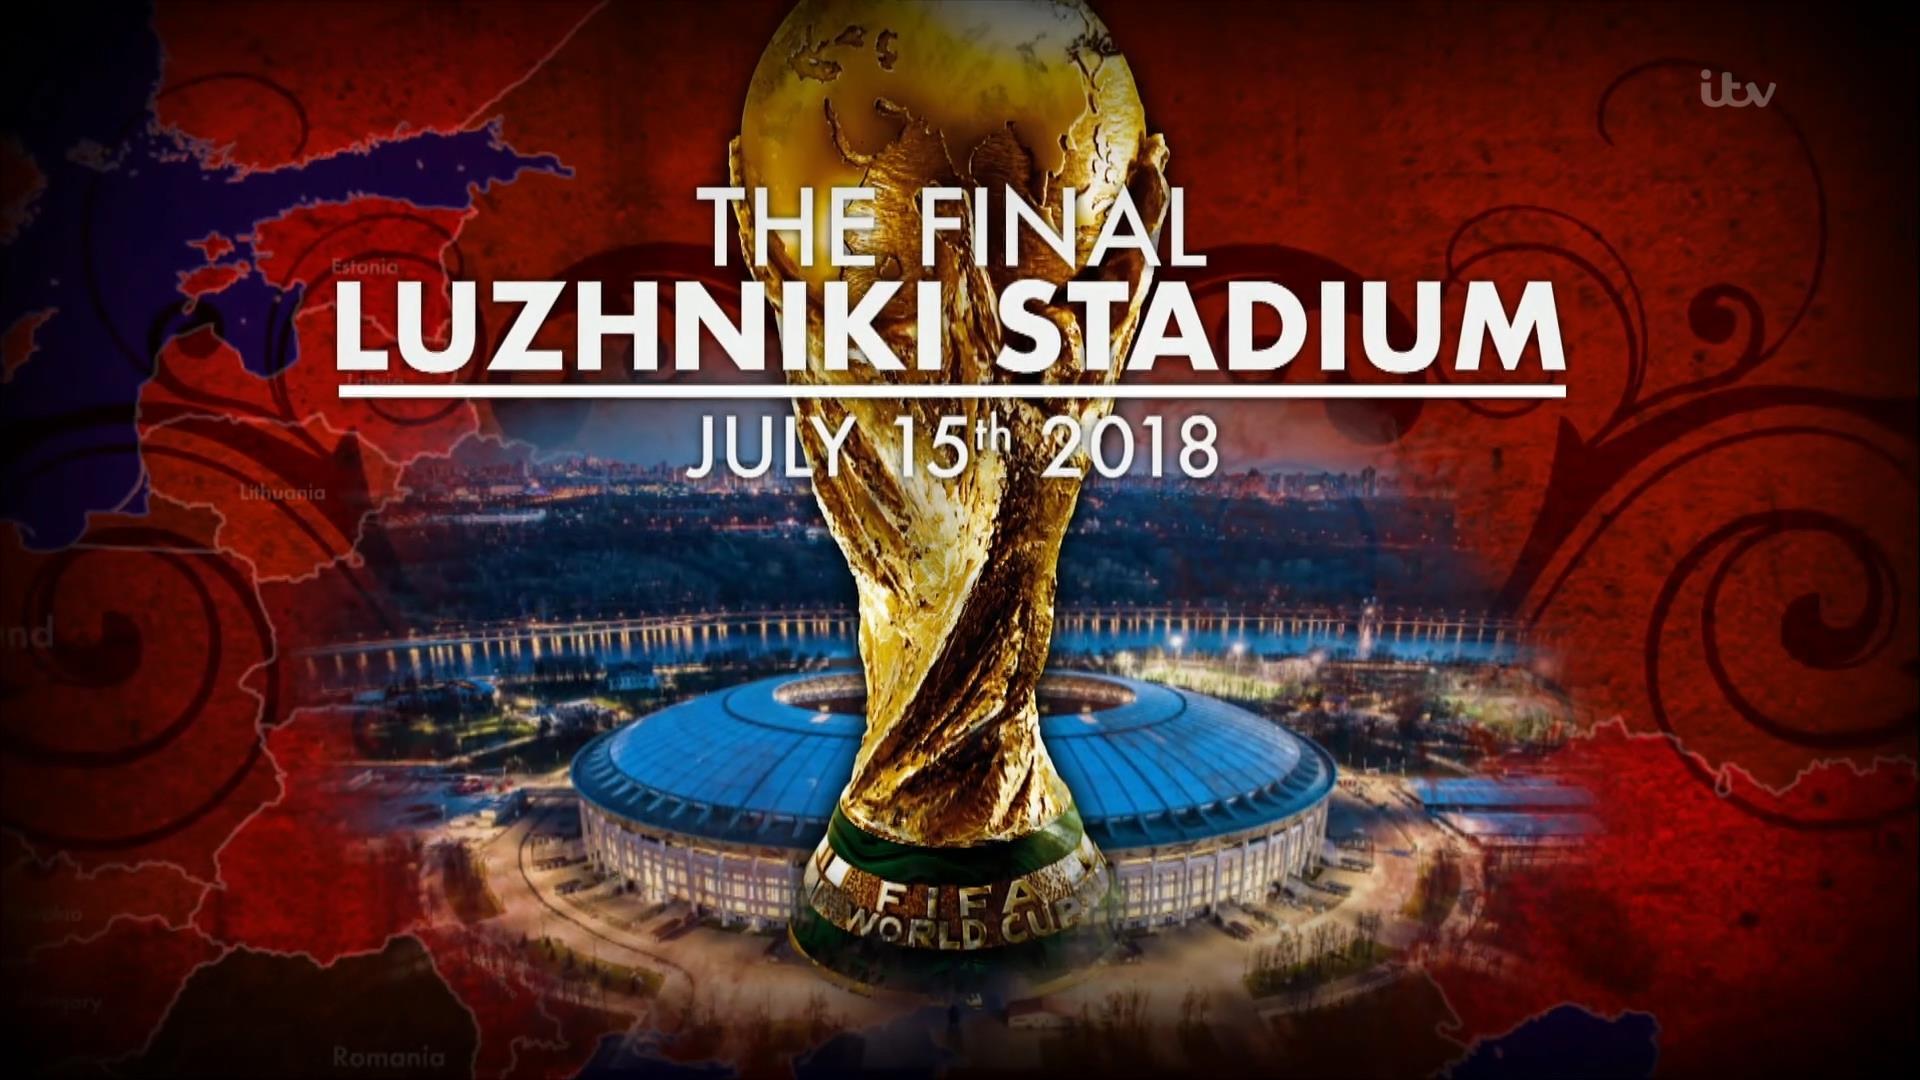 France v Croatia – World Cup 2018 Final – Live TV Coverage on BBC, ITV, BBC iPlayer, ITV Hub